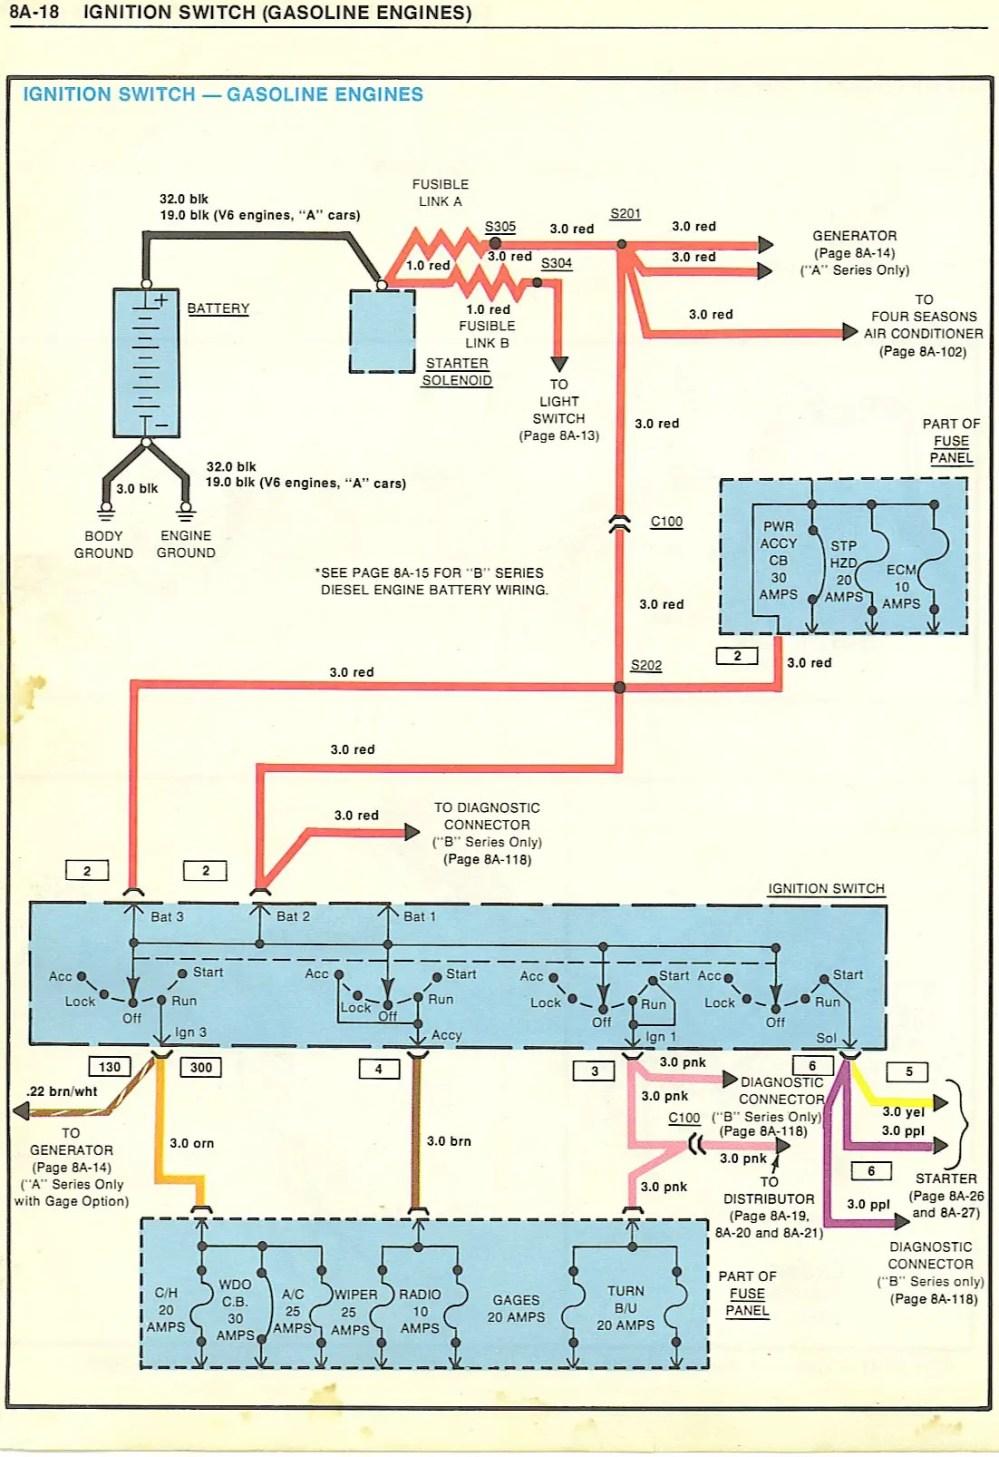 medium resolution of 2000 chevy monte carlo engine diagram wiring library2000 chevy monte carlo engine diagram